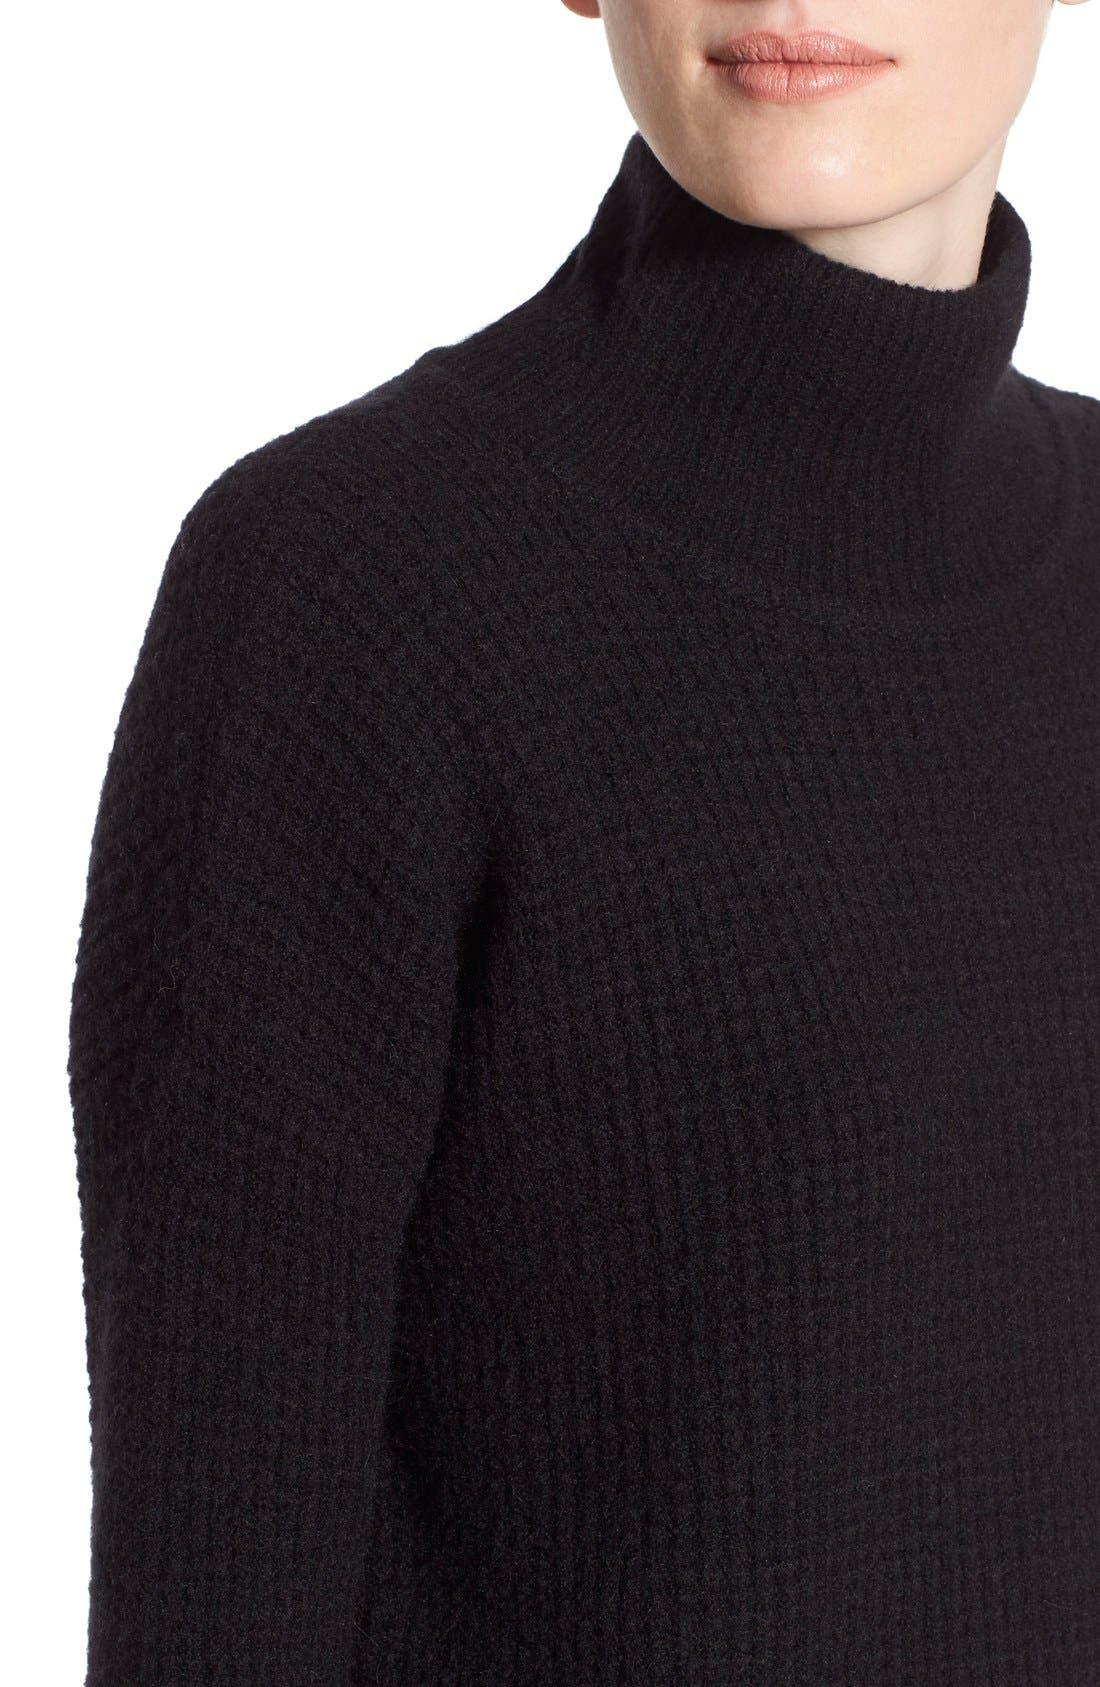 Wafflestitch Turtleneck Sweater,                             Alternate thumbnail 5, color,                             001